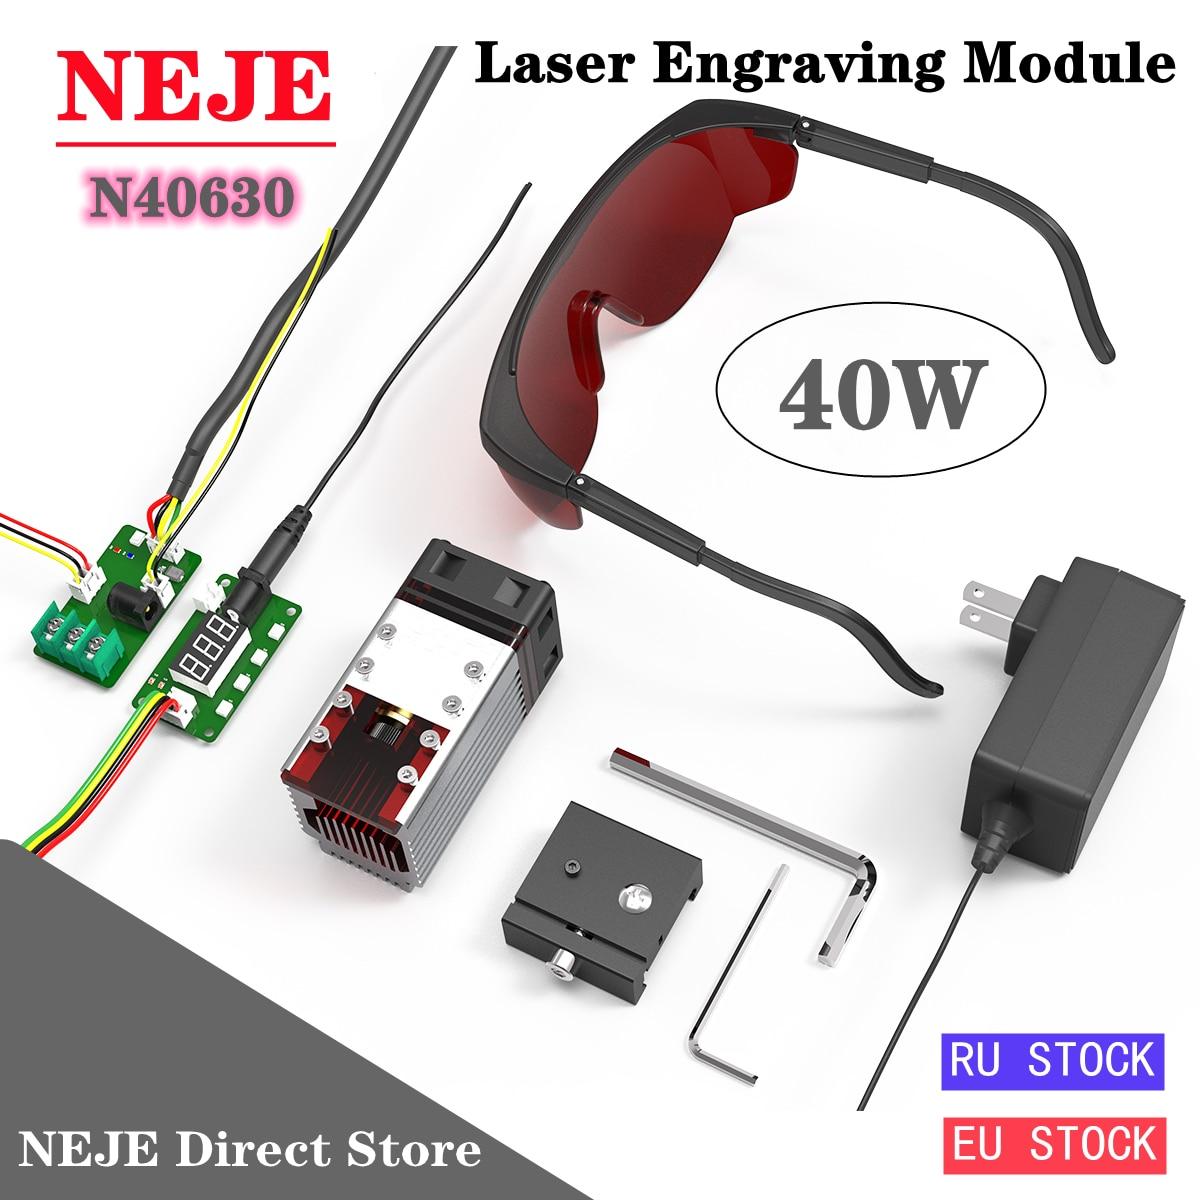 NEJE 40W N40630 Laser Module kits with TTL/PWM Modulation for CNC Laser Engraver Machine Wood Marking Cutting Tool 3D printer